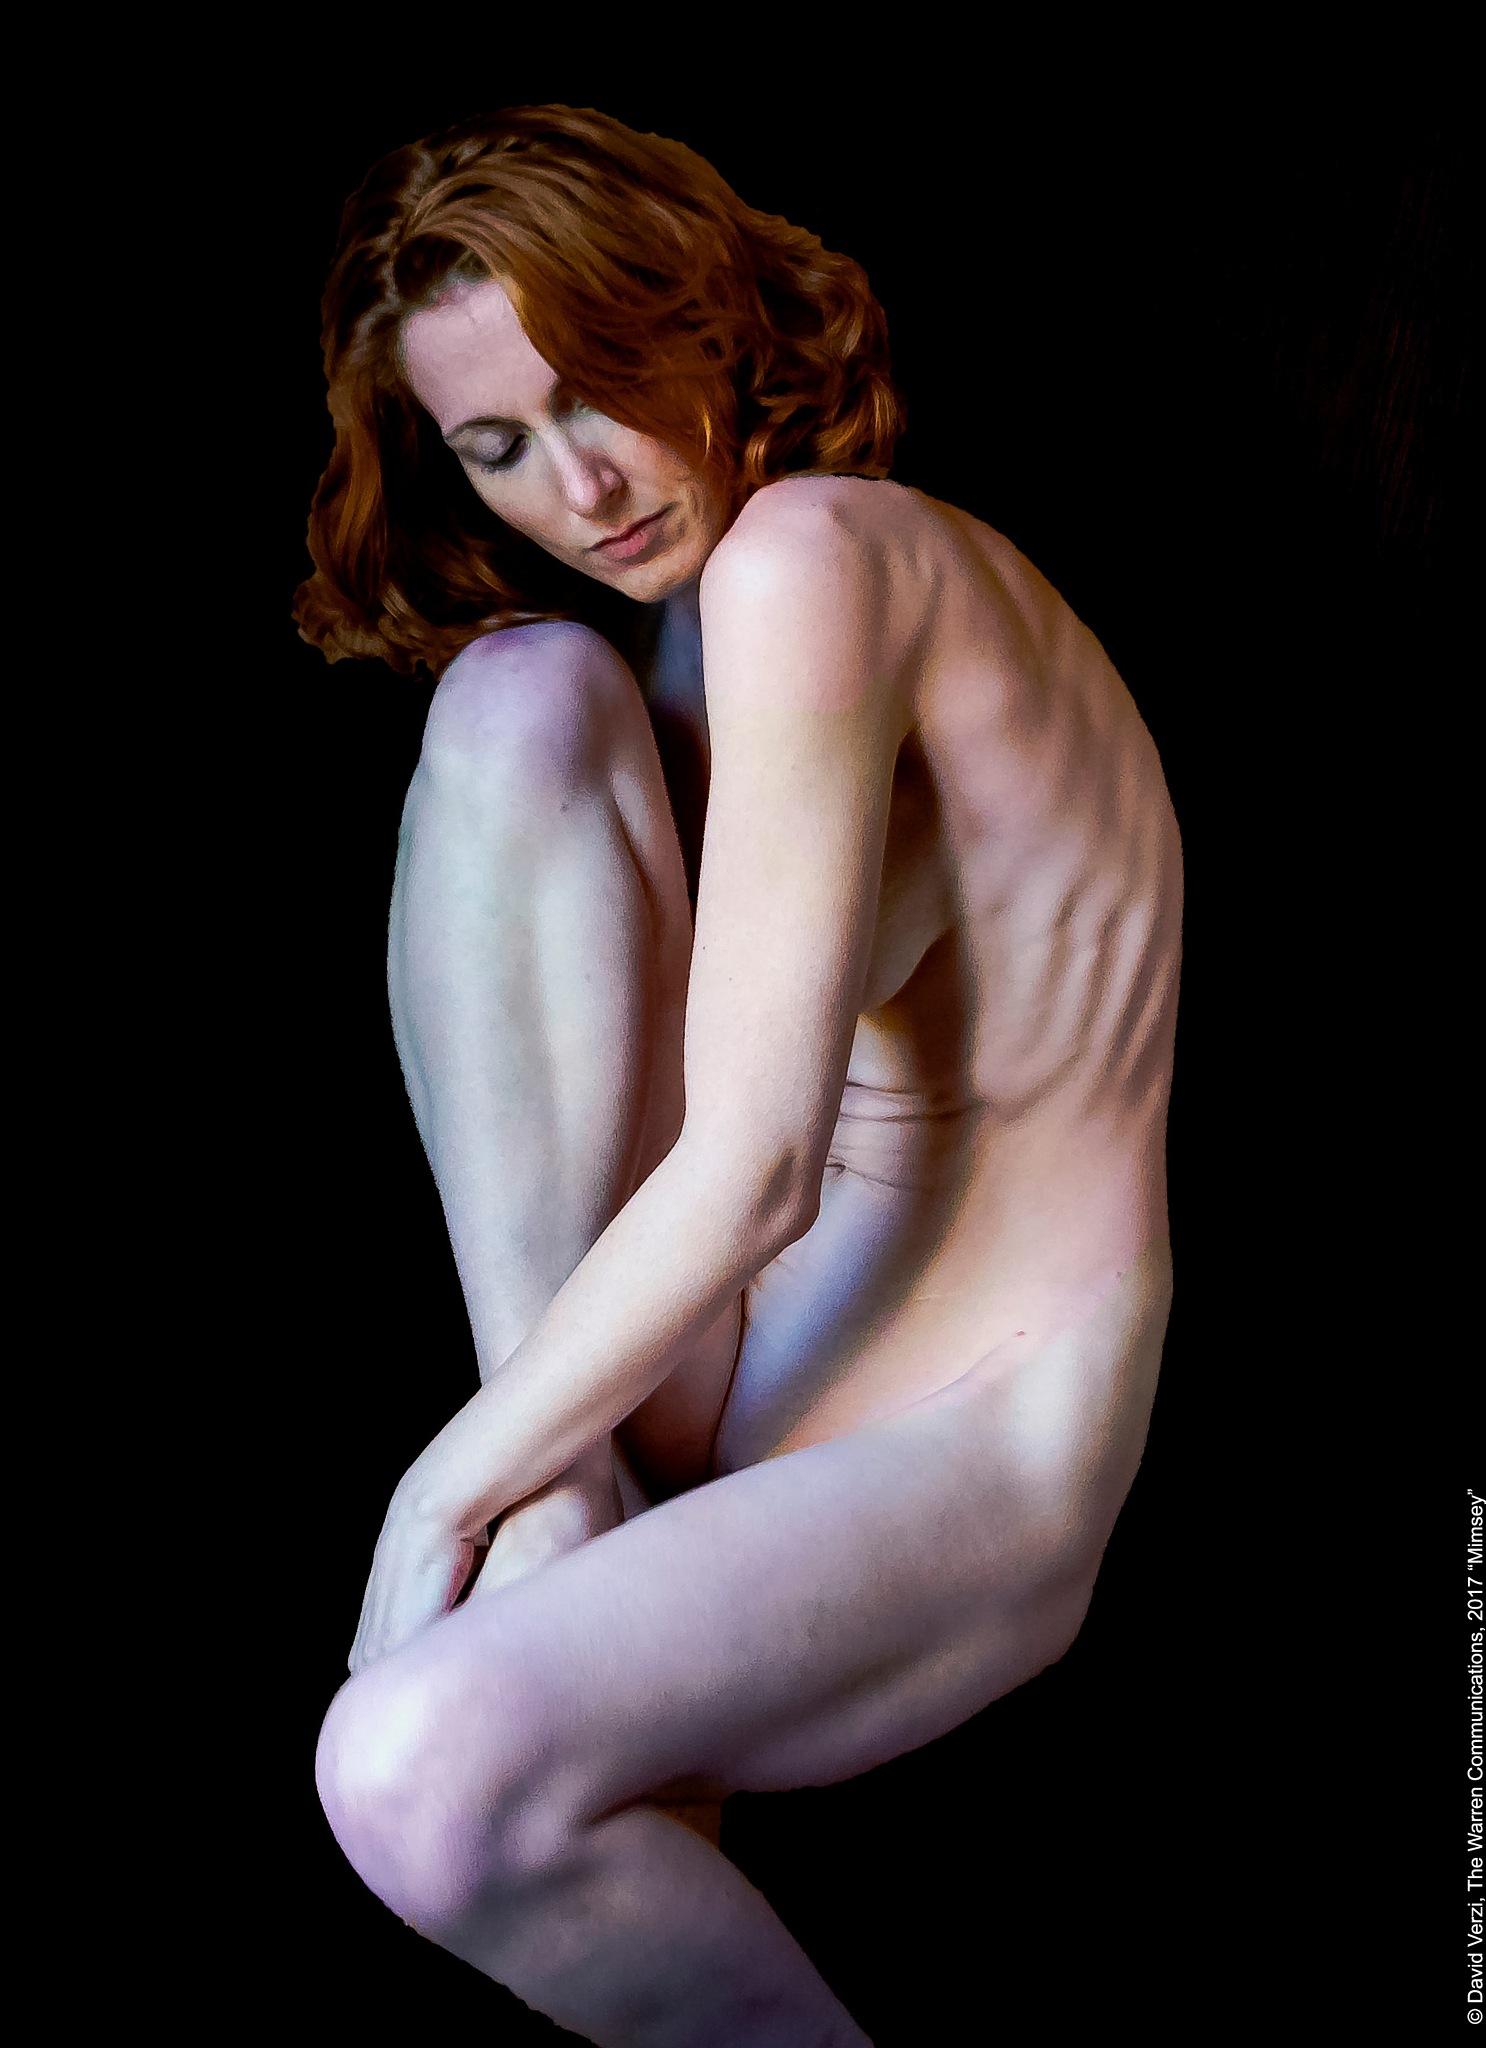 MIMSEY by David Verzi